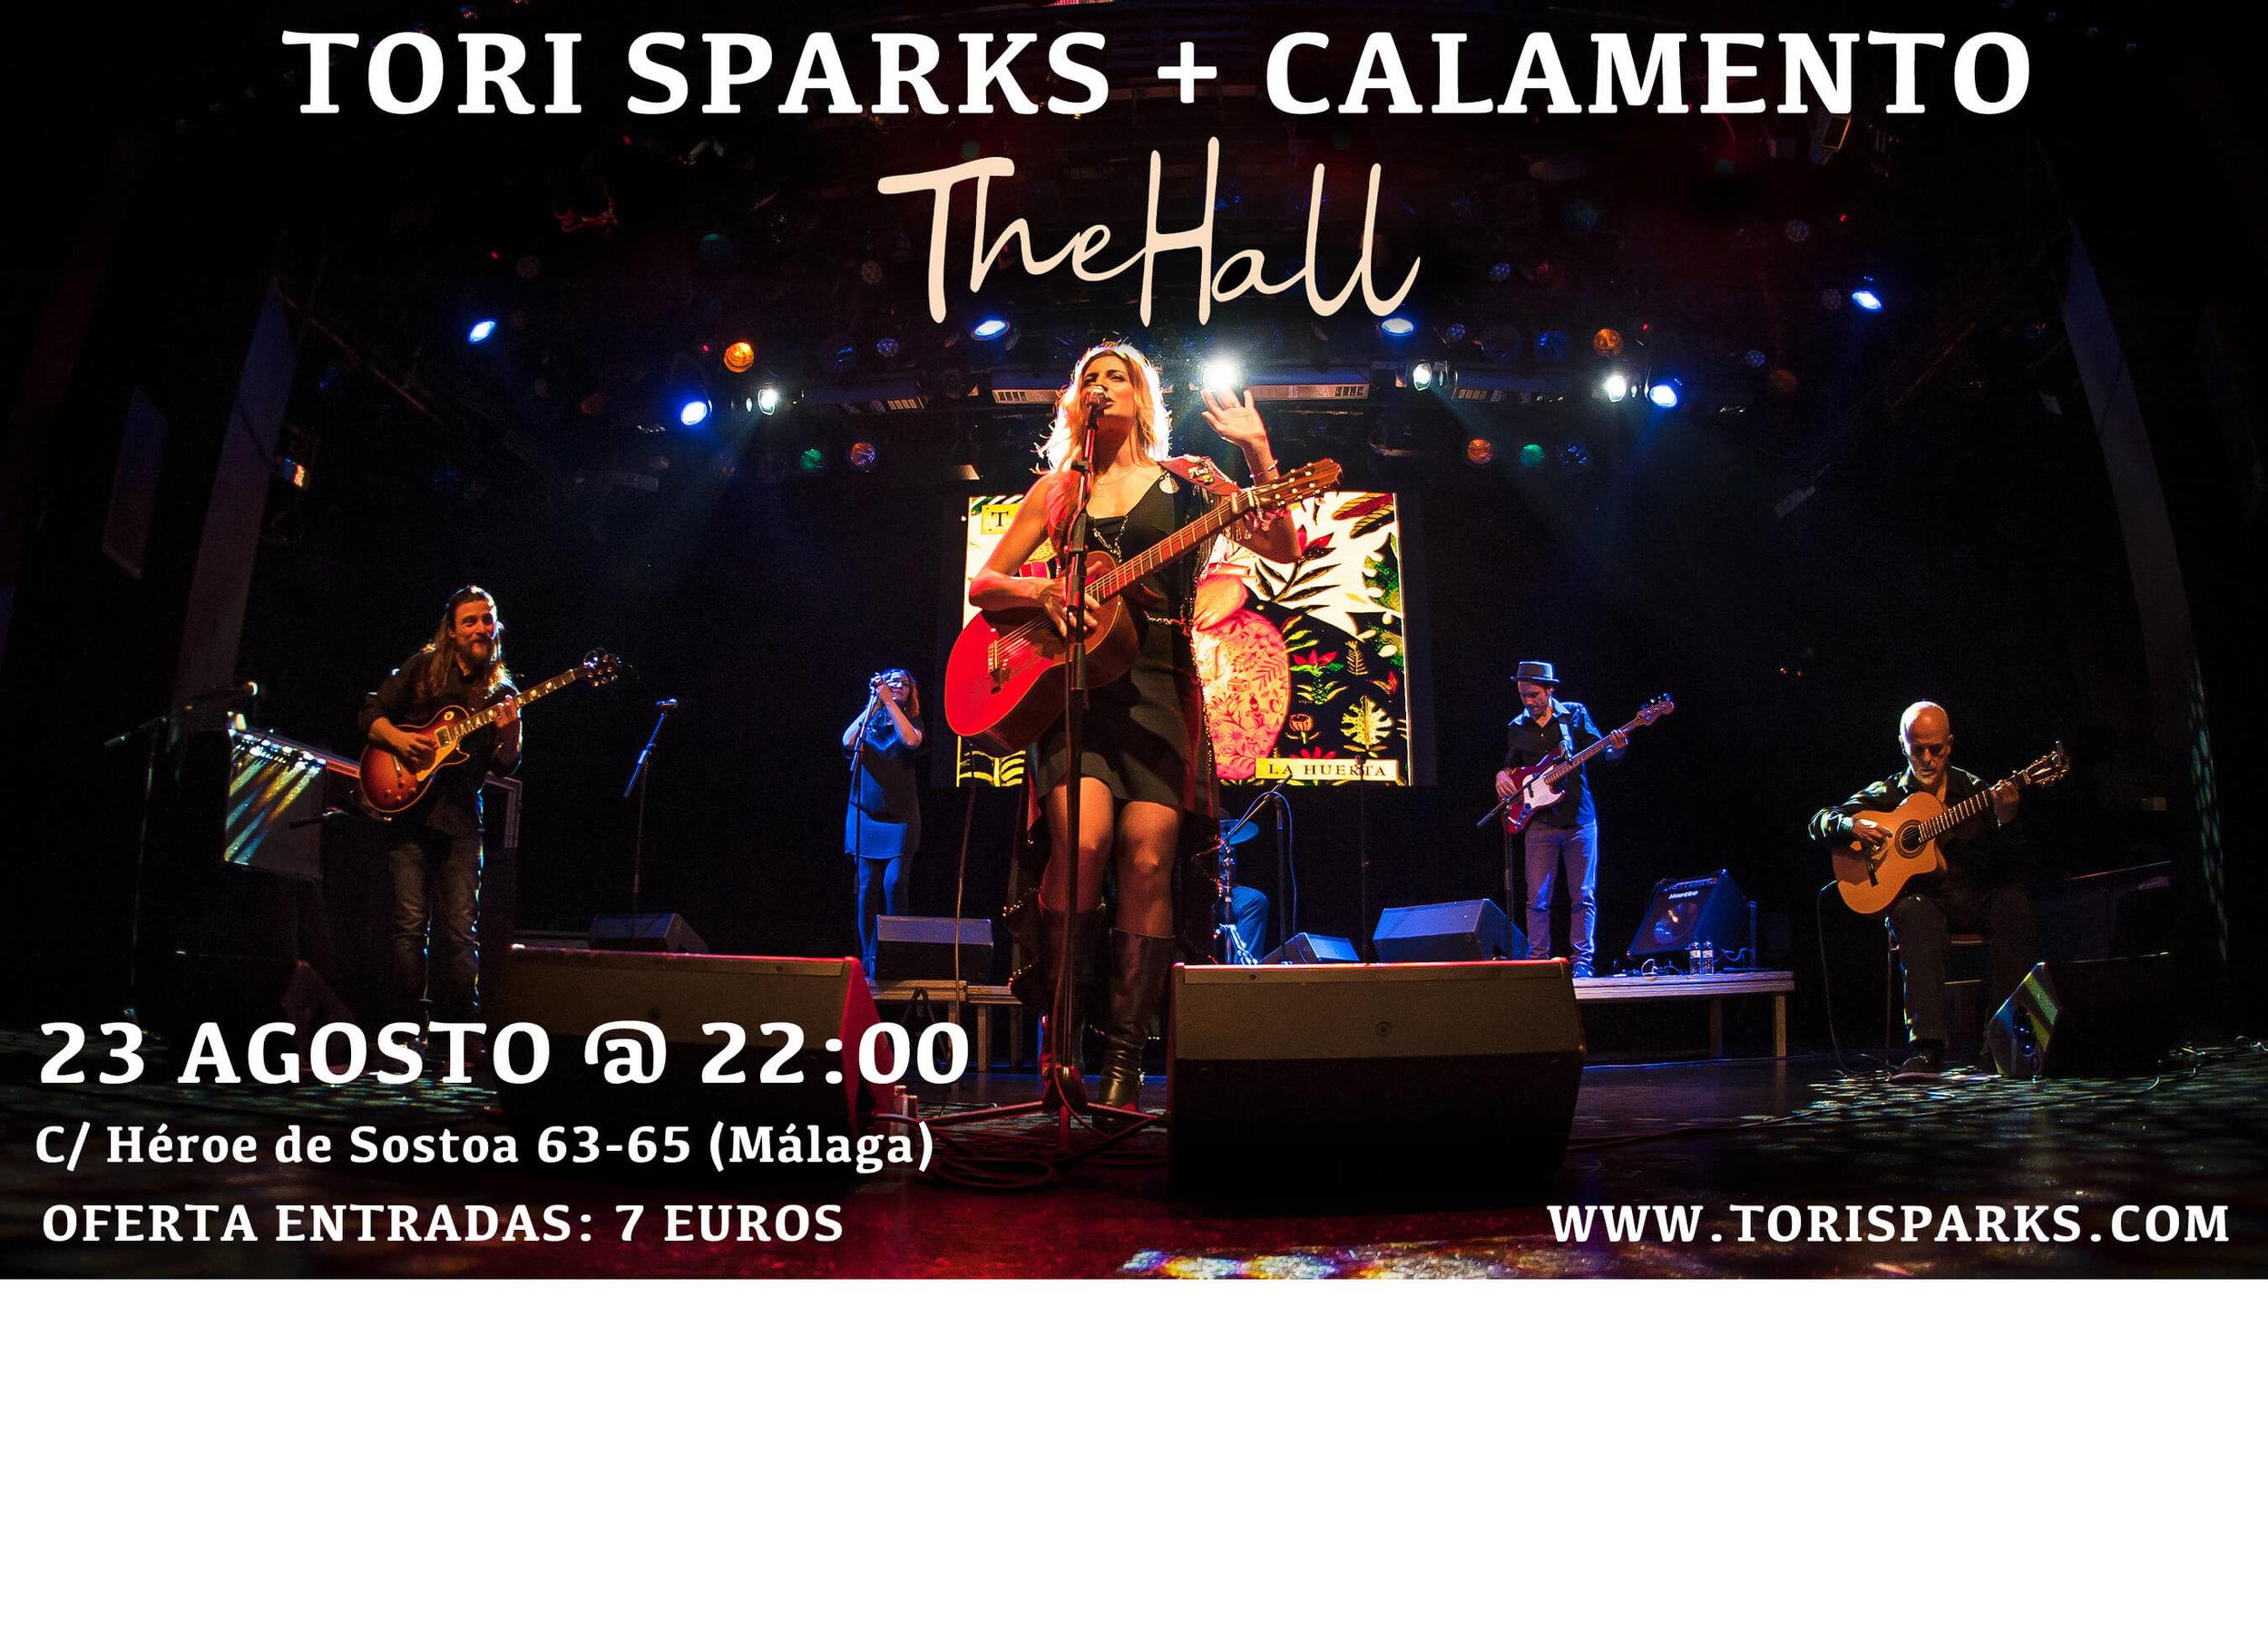 Tori Sparks The Hall Malaga